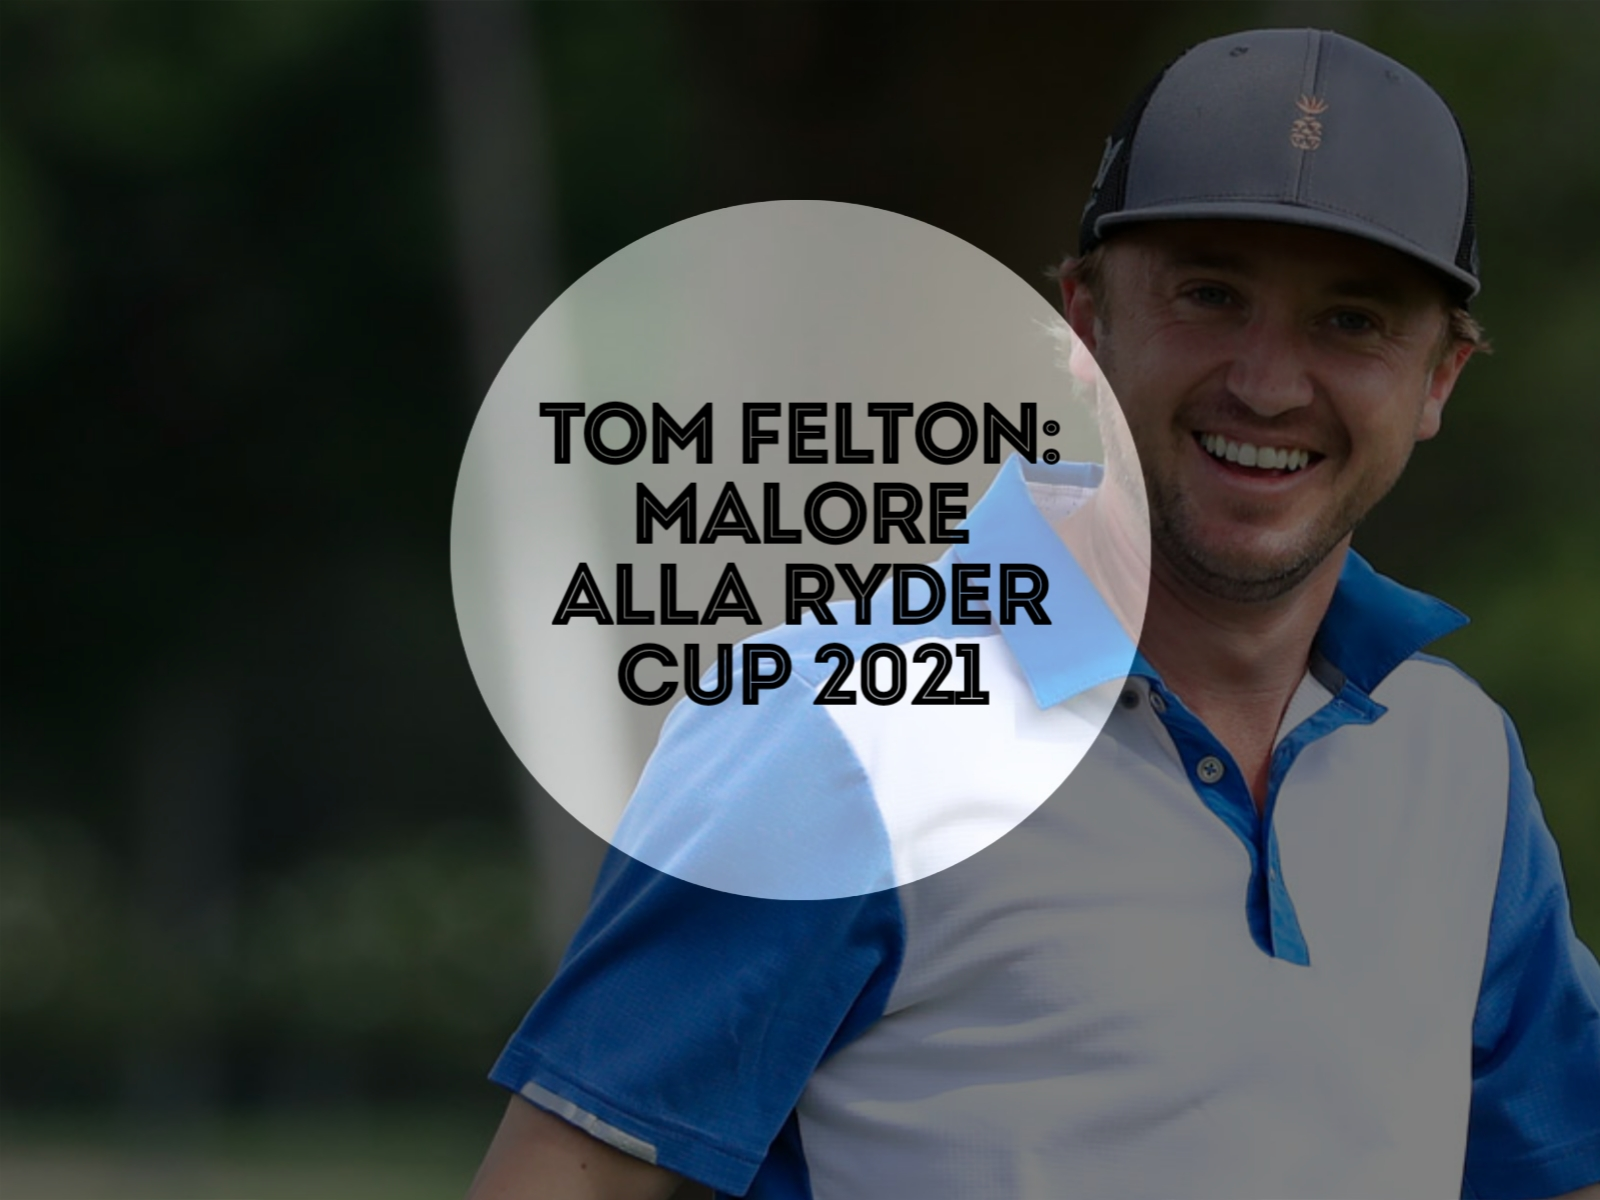 Tom Felton: malore alla ryder up 2021